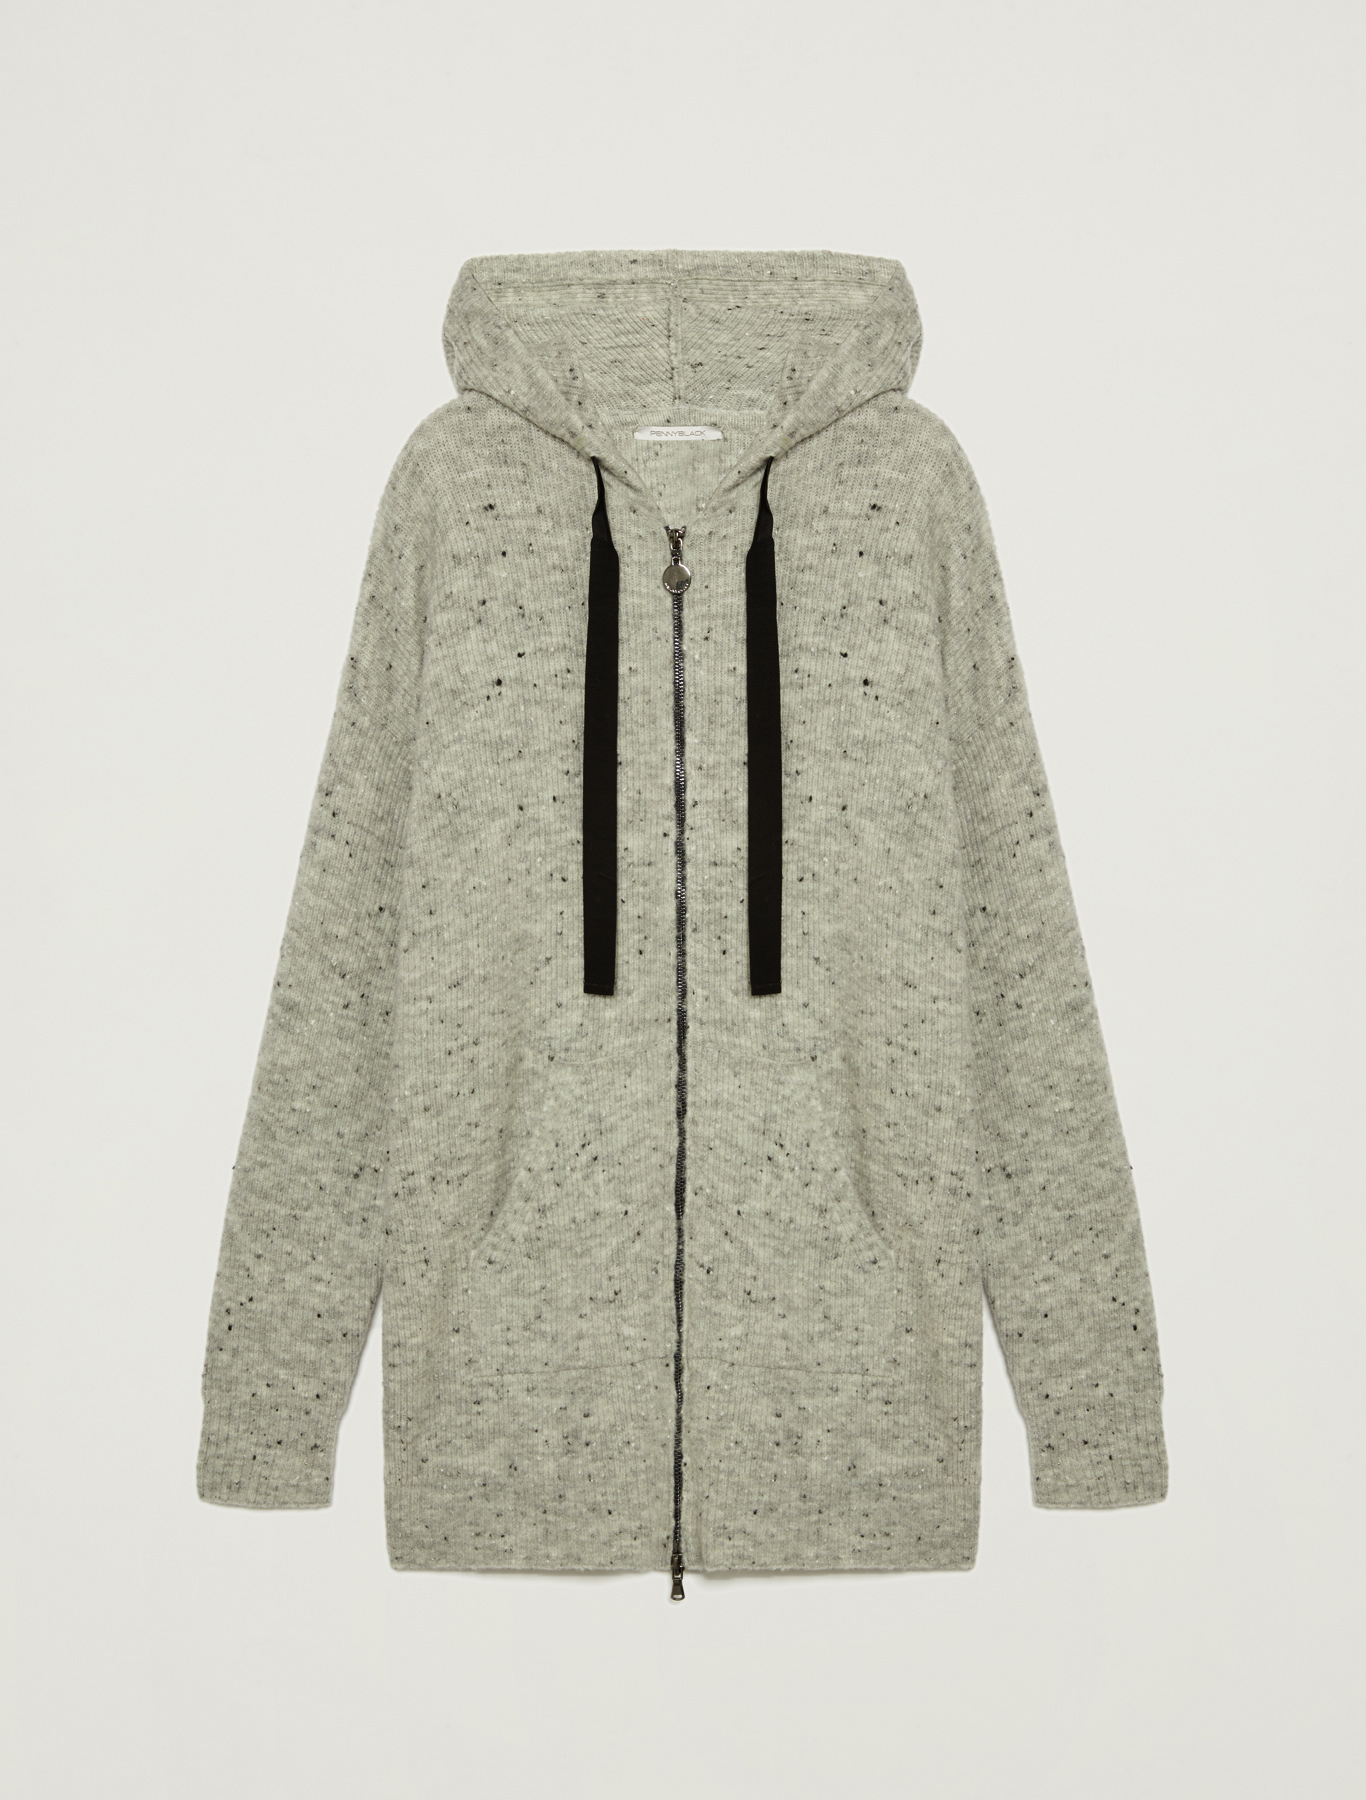 Hooded tweed cardigan - light grey - pennyblack